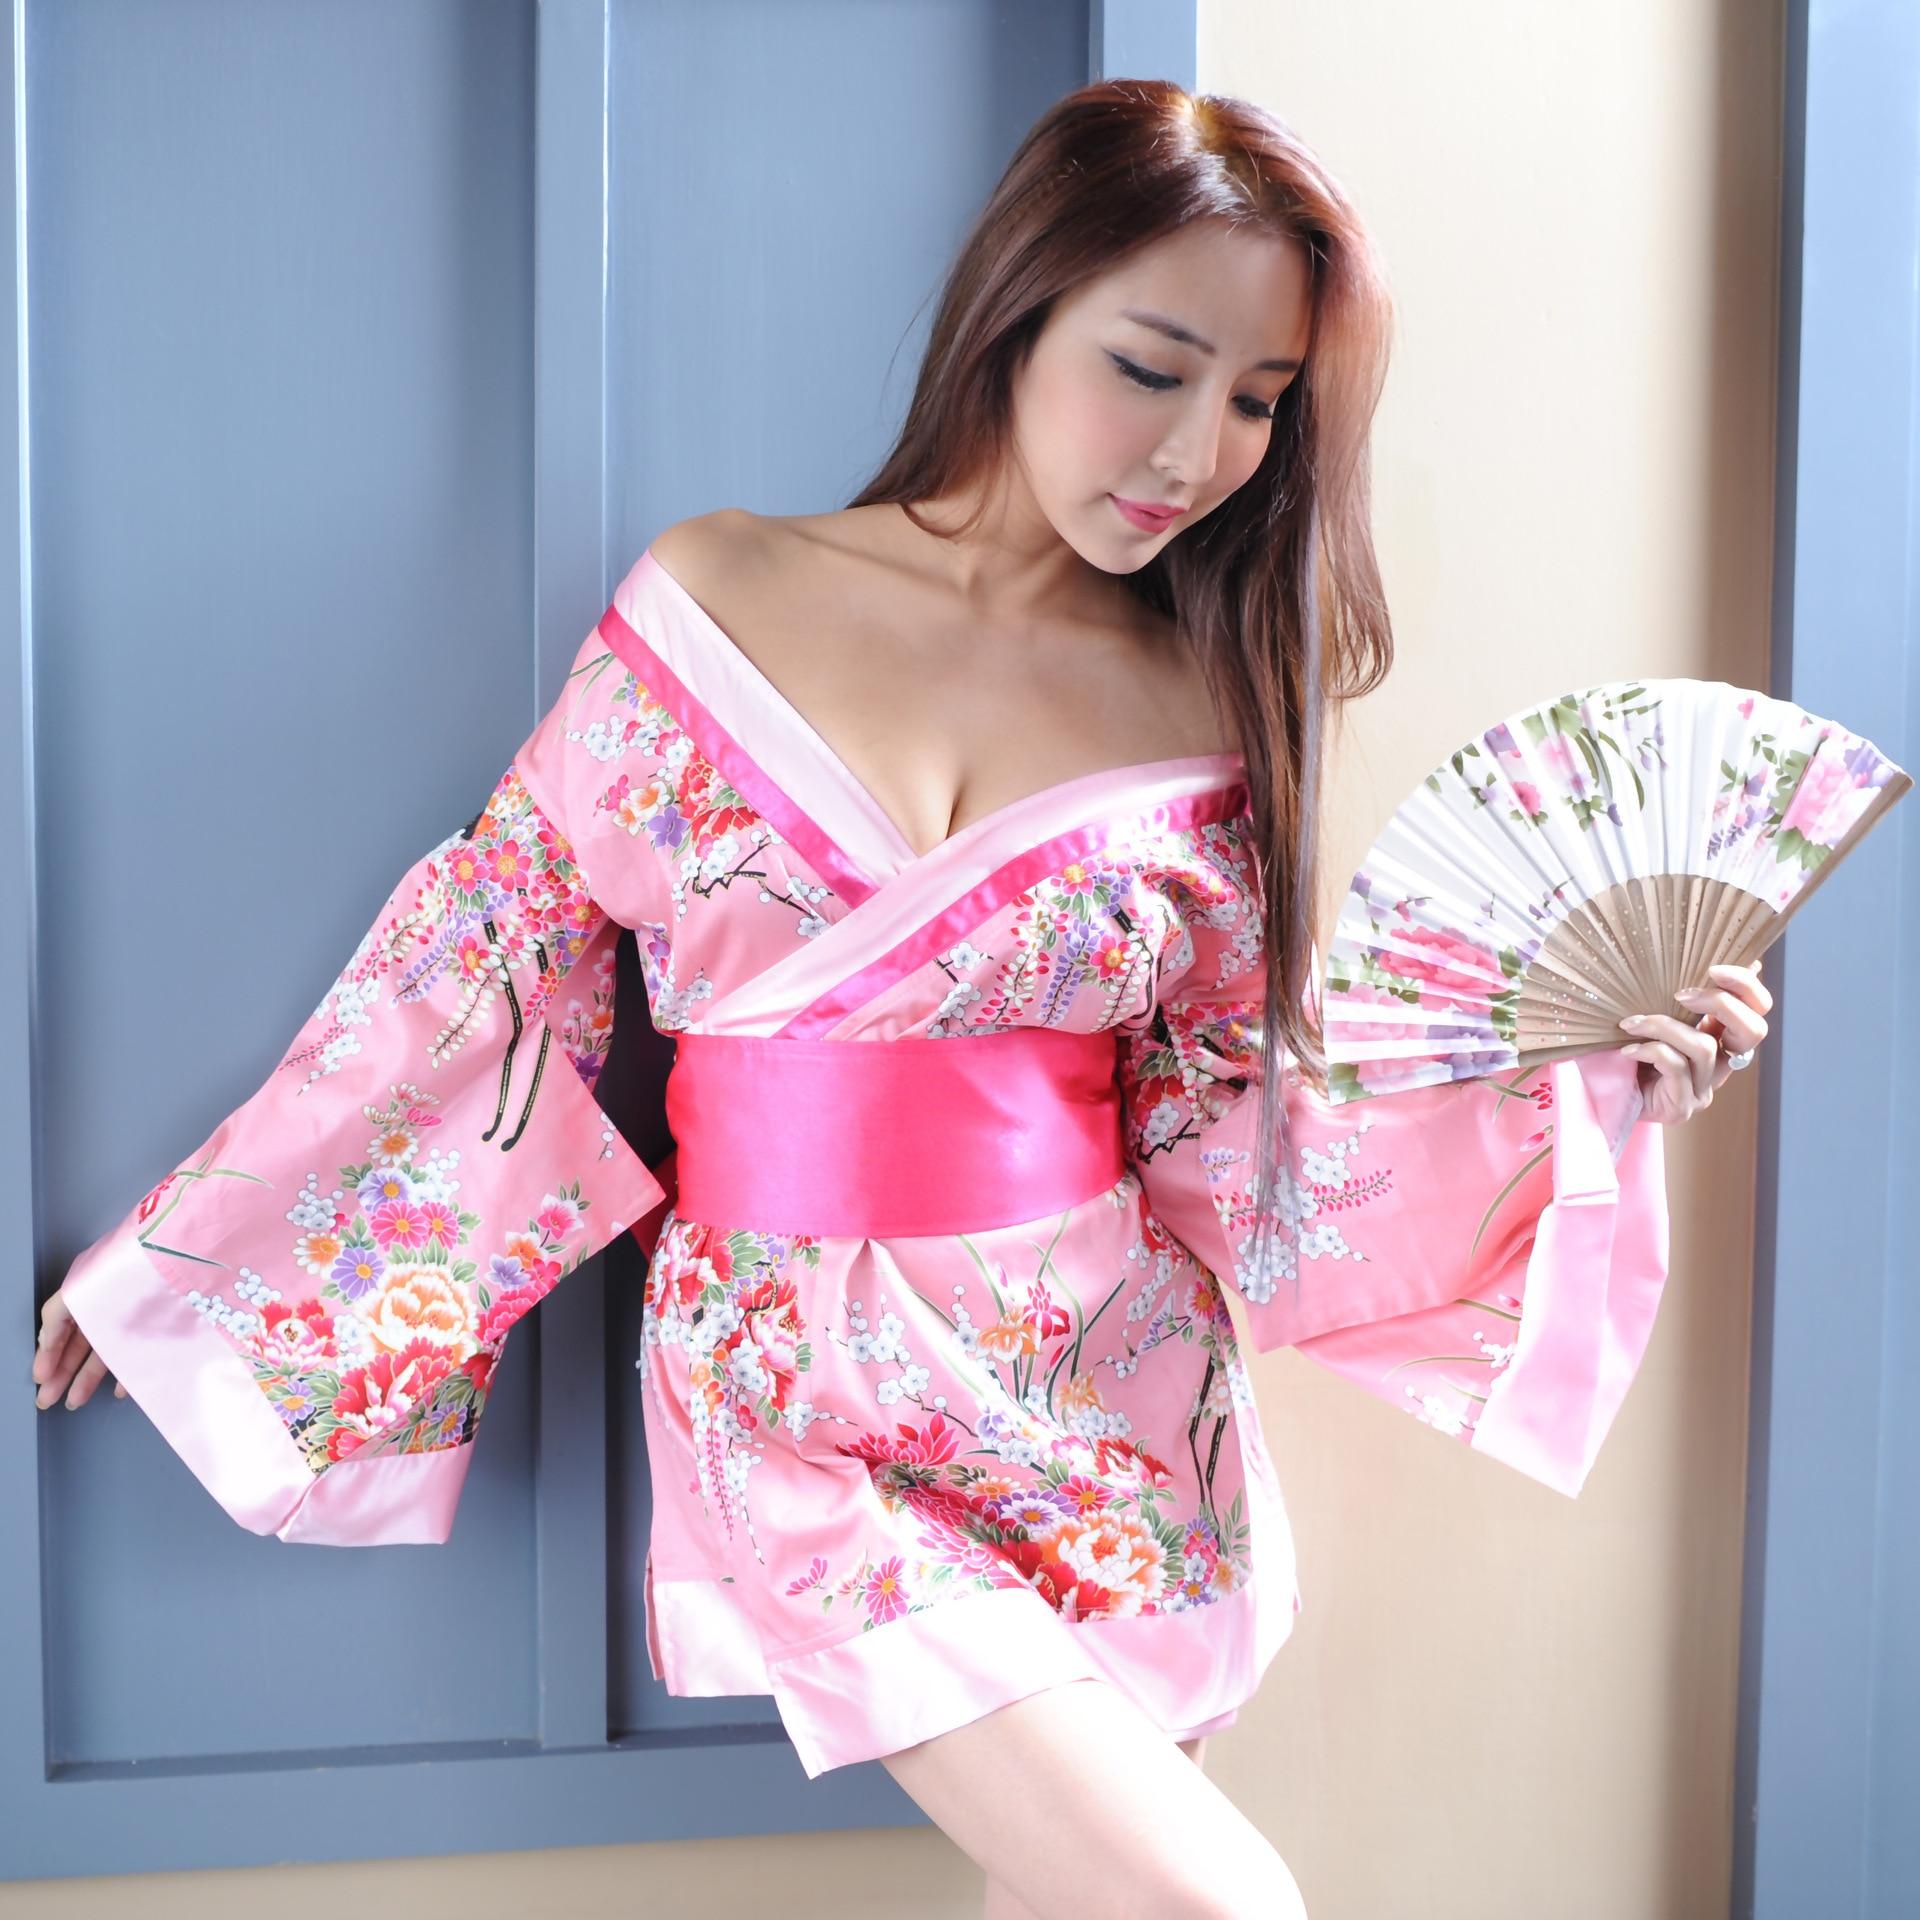 Valentines Day Heart Men's Women's Sexy Short Kimono